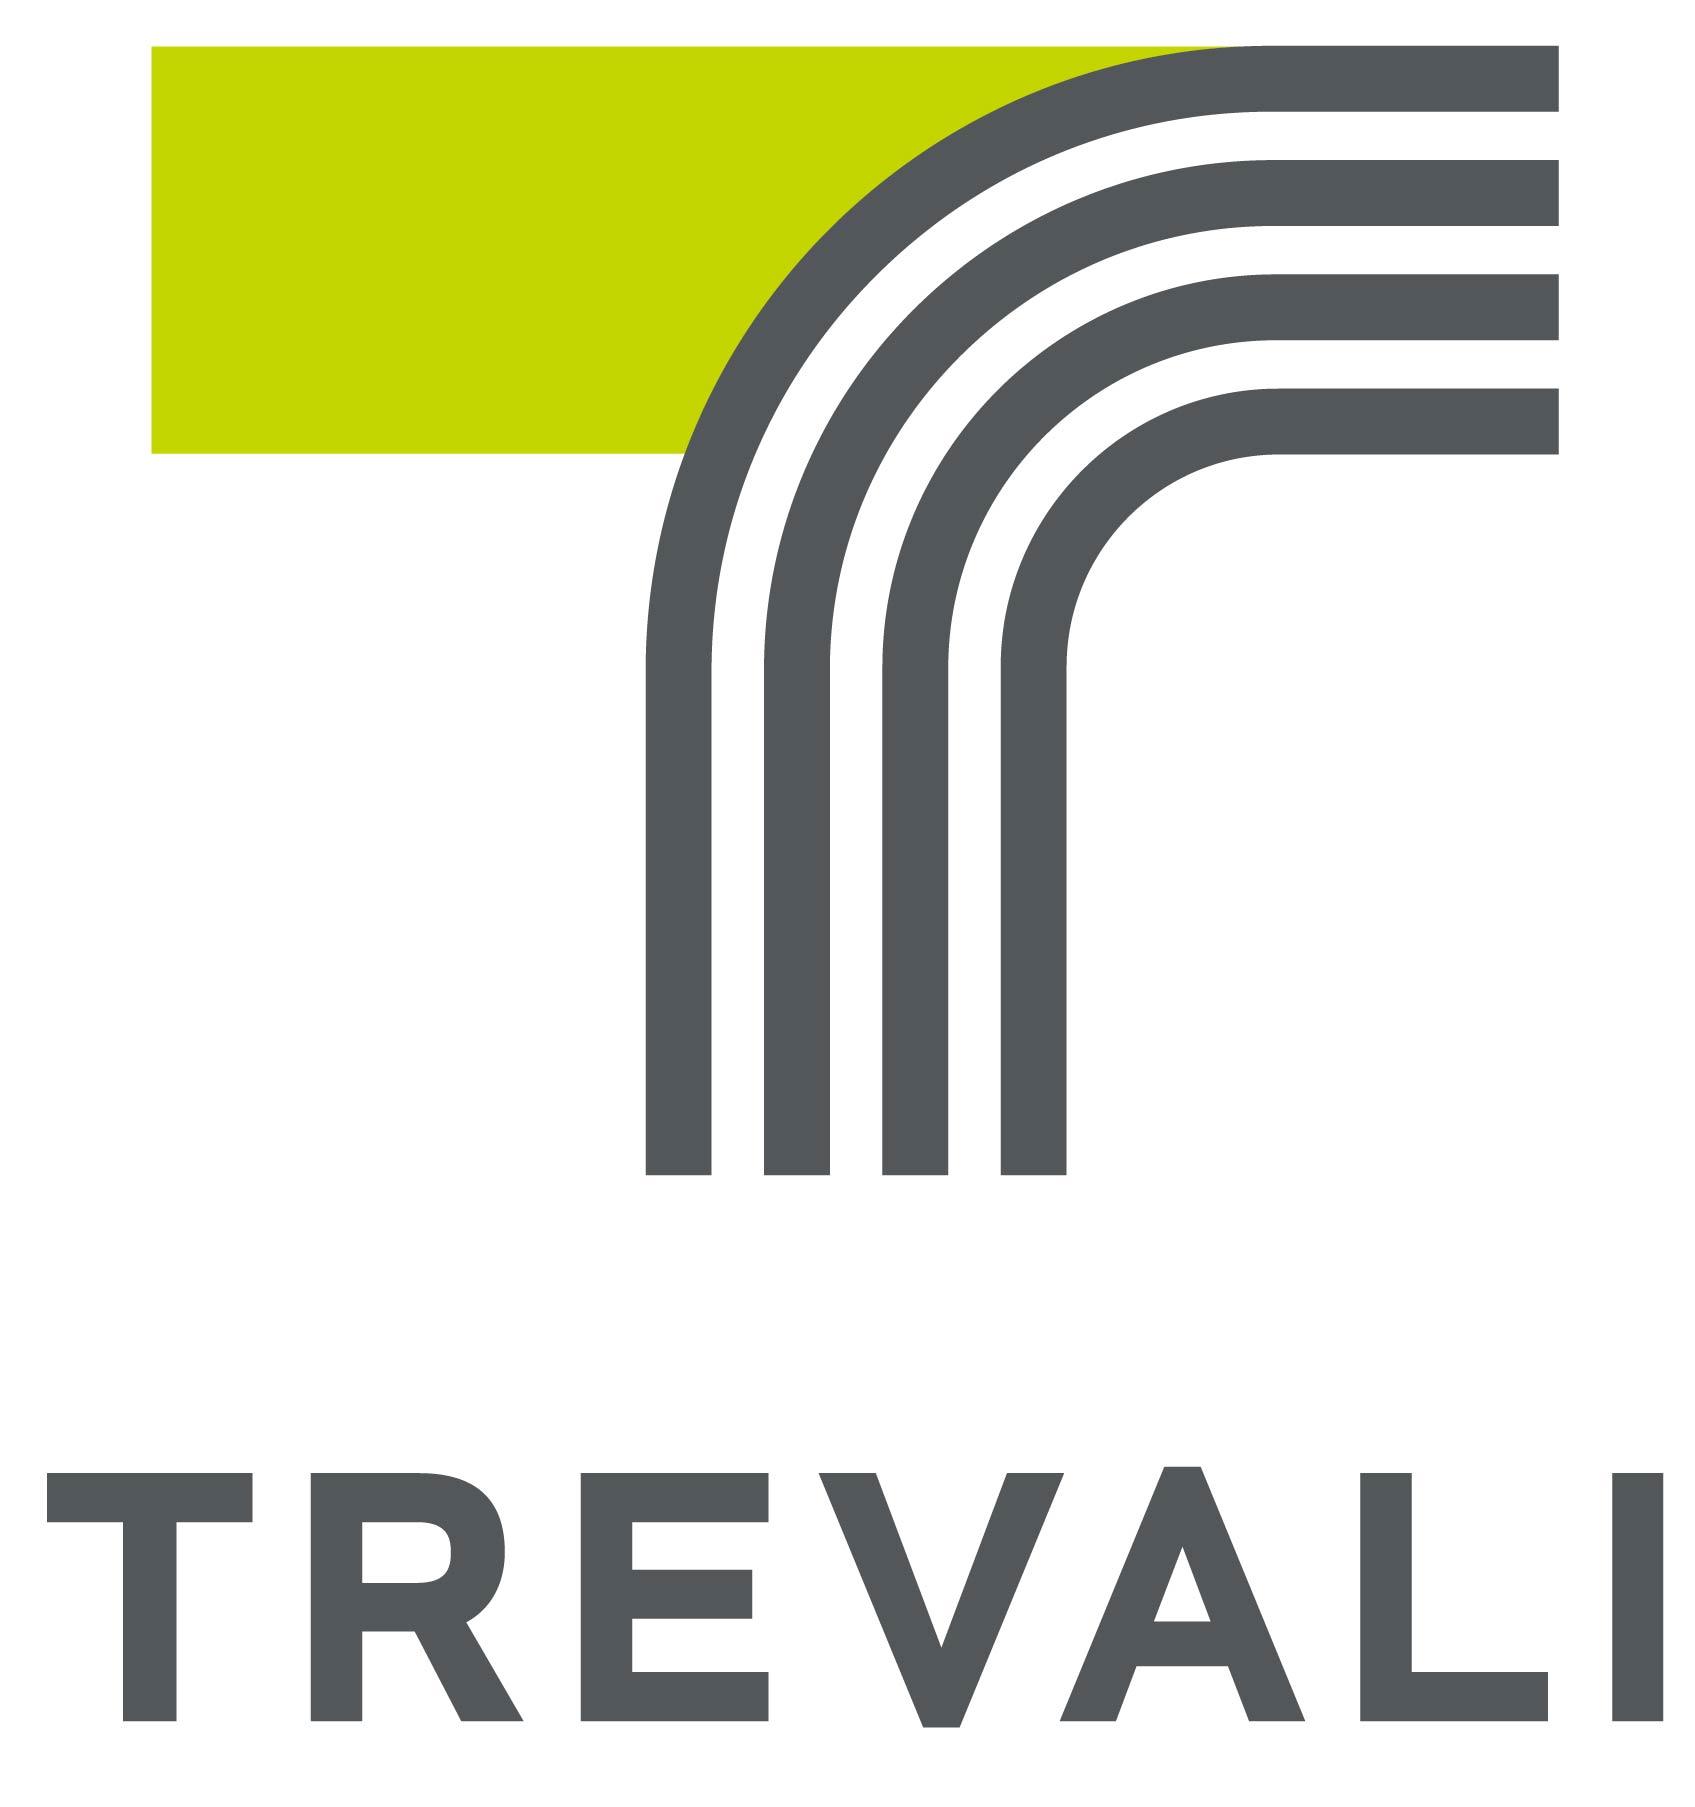 TREVALI MINING